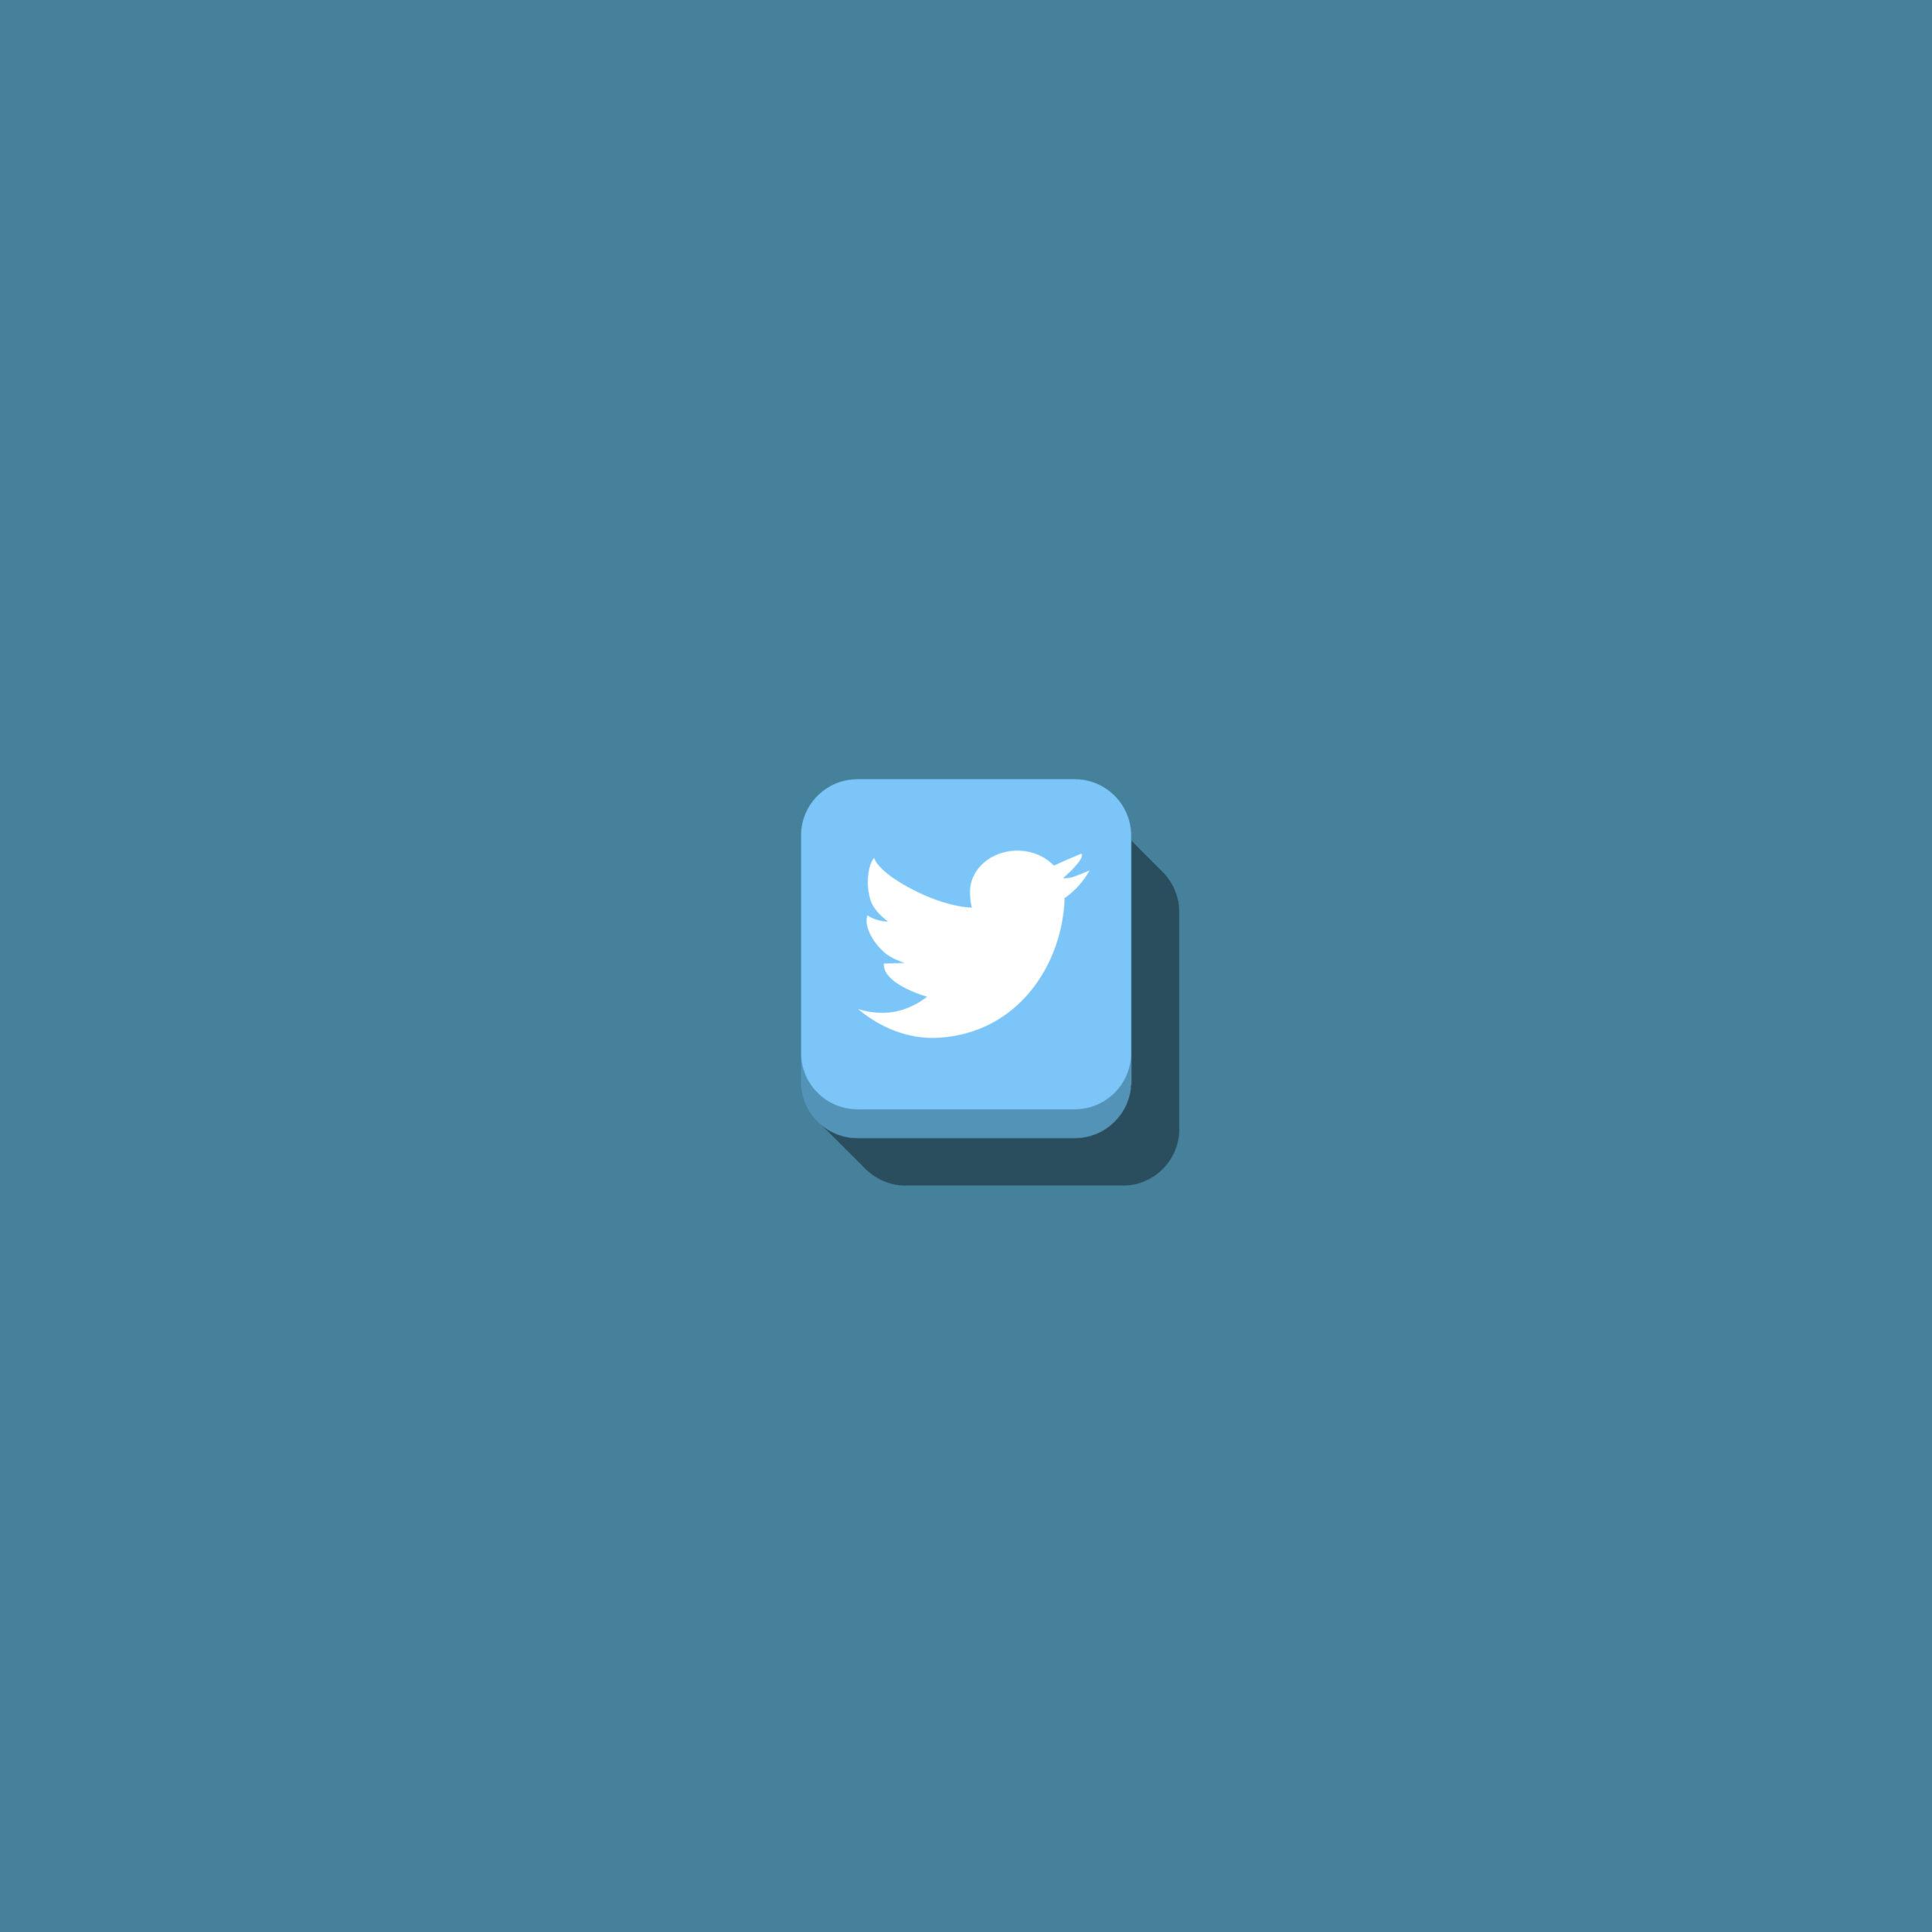 【Twitter】新鮮な情報が続々と